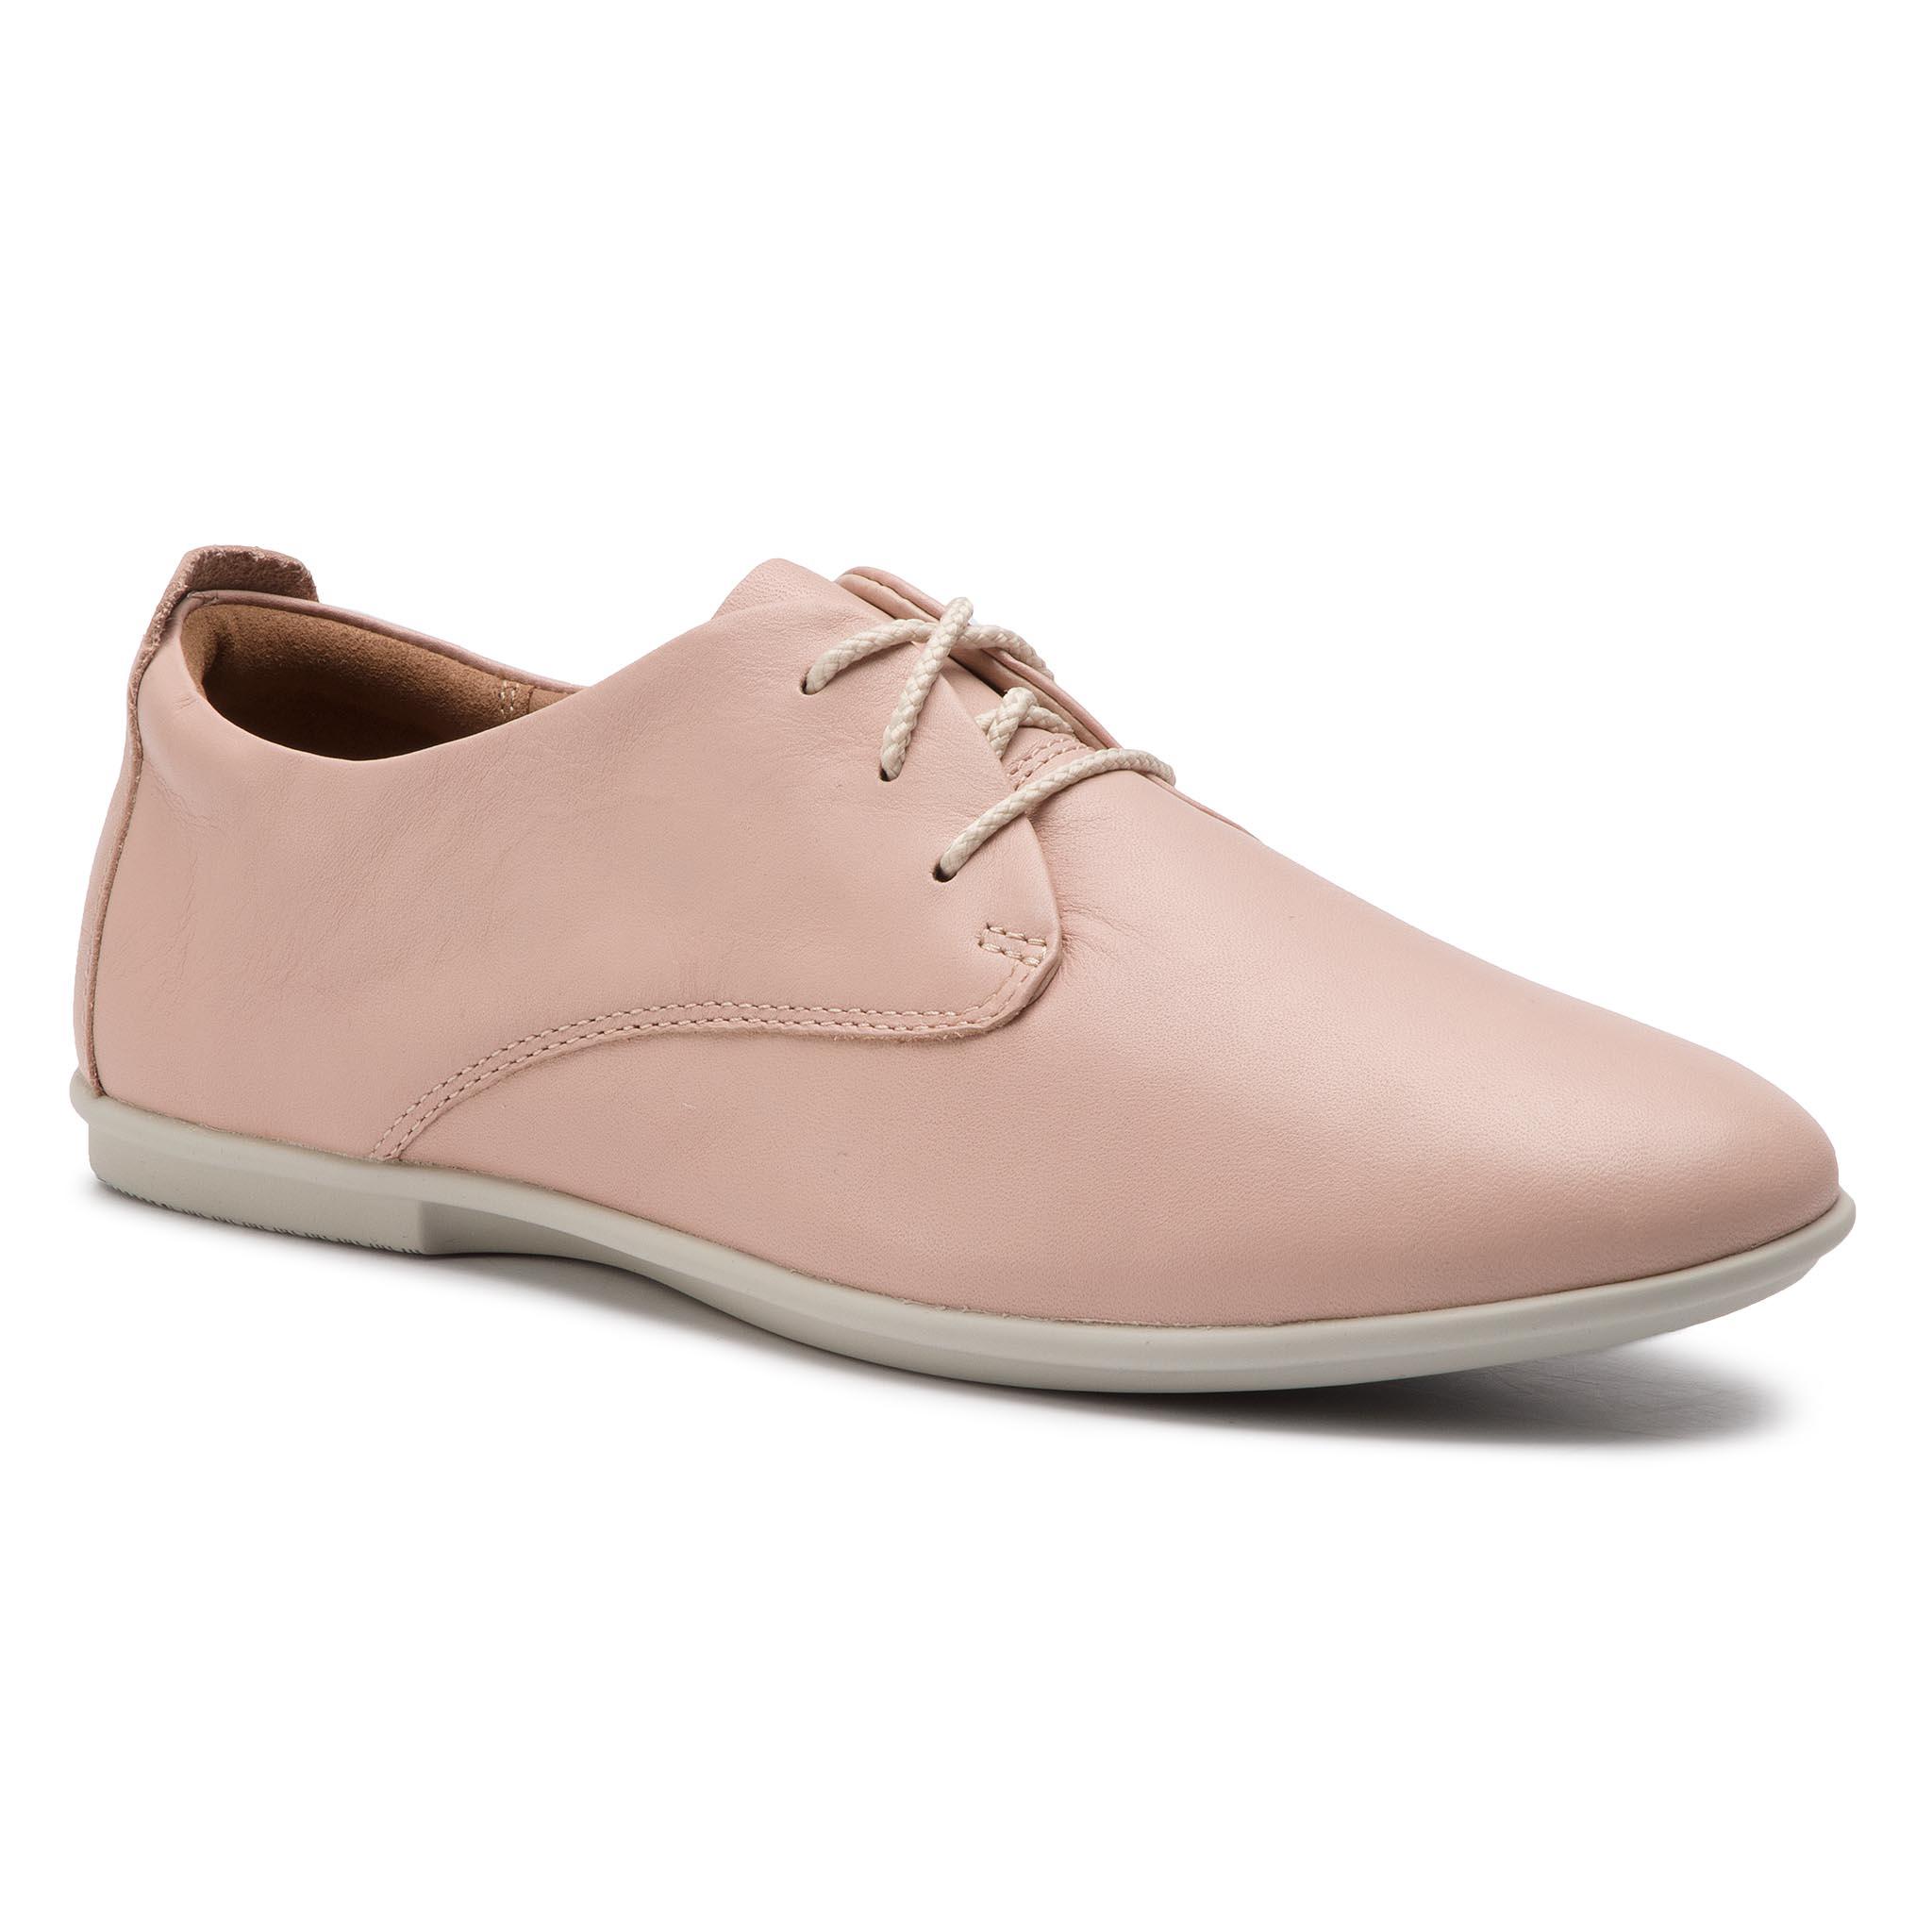 ae5c1c602b Oxford cipők CLARKS - Un Coral Lace 261403604 Blush Leather - Glami.hu